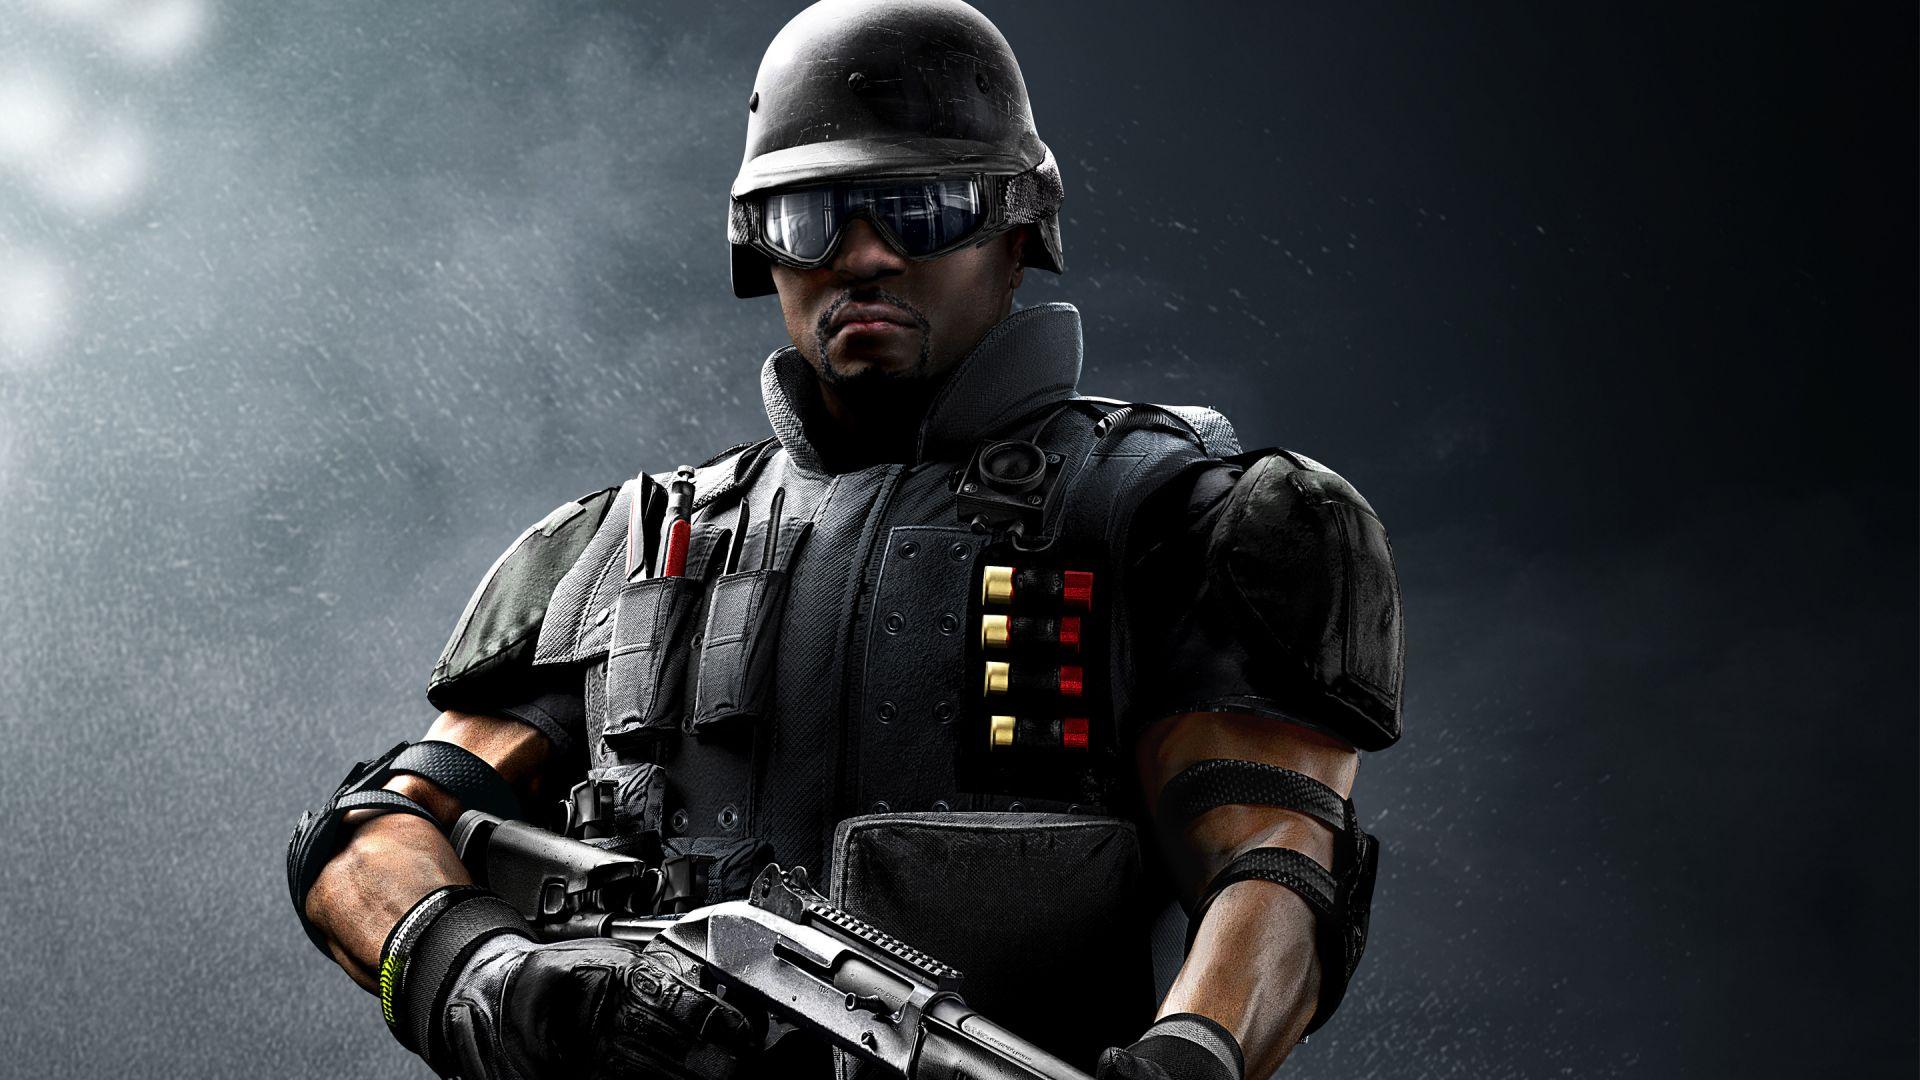 Wallpaper Tom clancy's rainbow six siege video game, fbi, swat castle